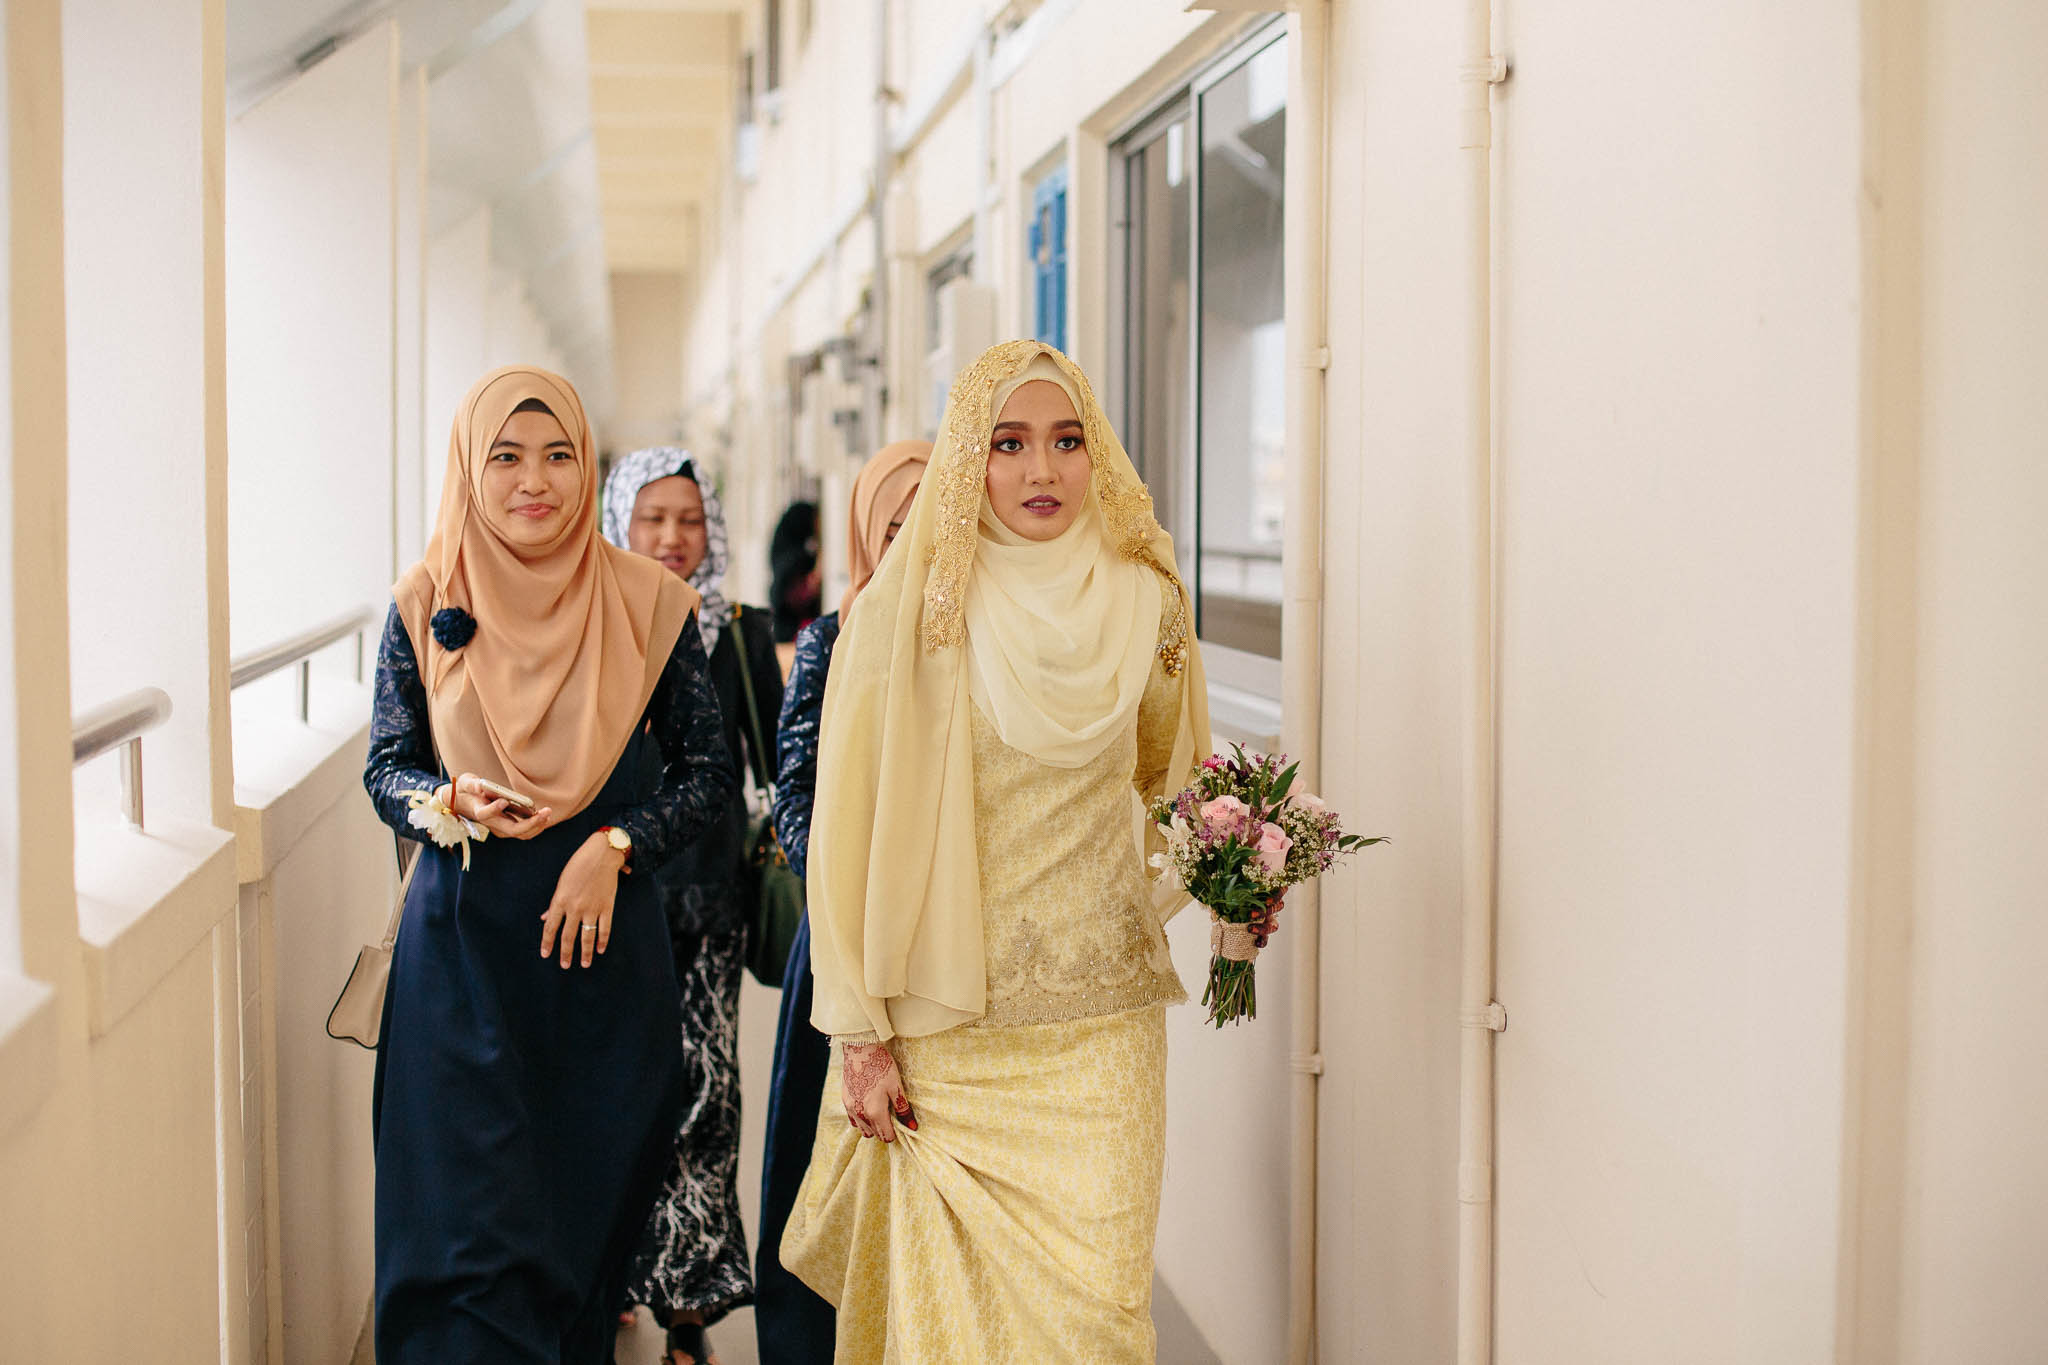 singapore-wedding-photographer-sharalyn-syazwan-027.jpg